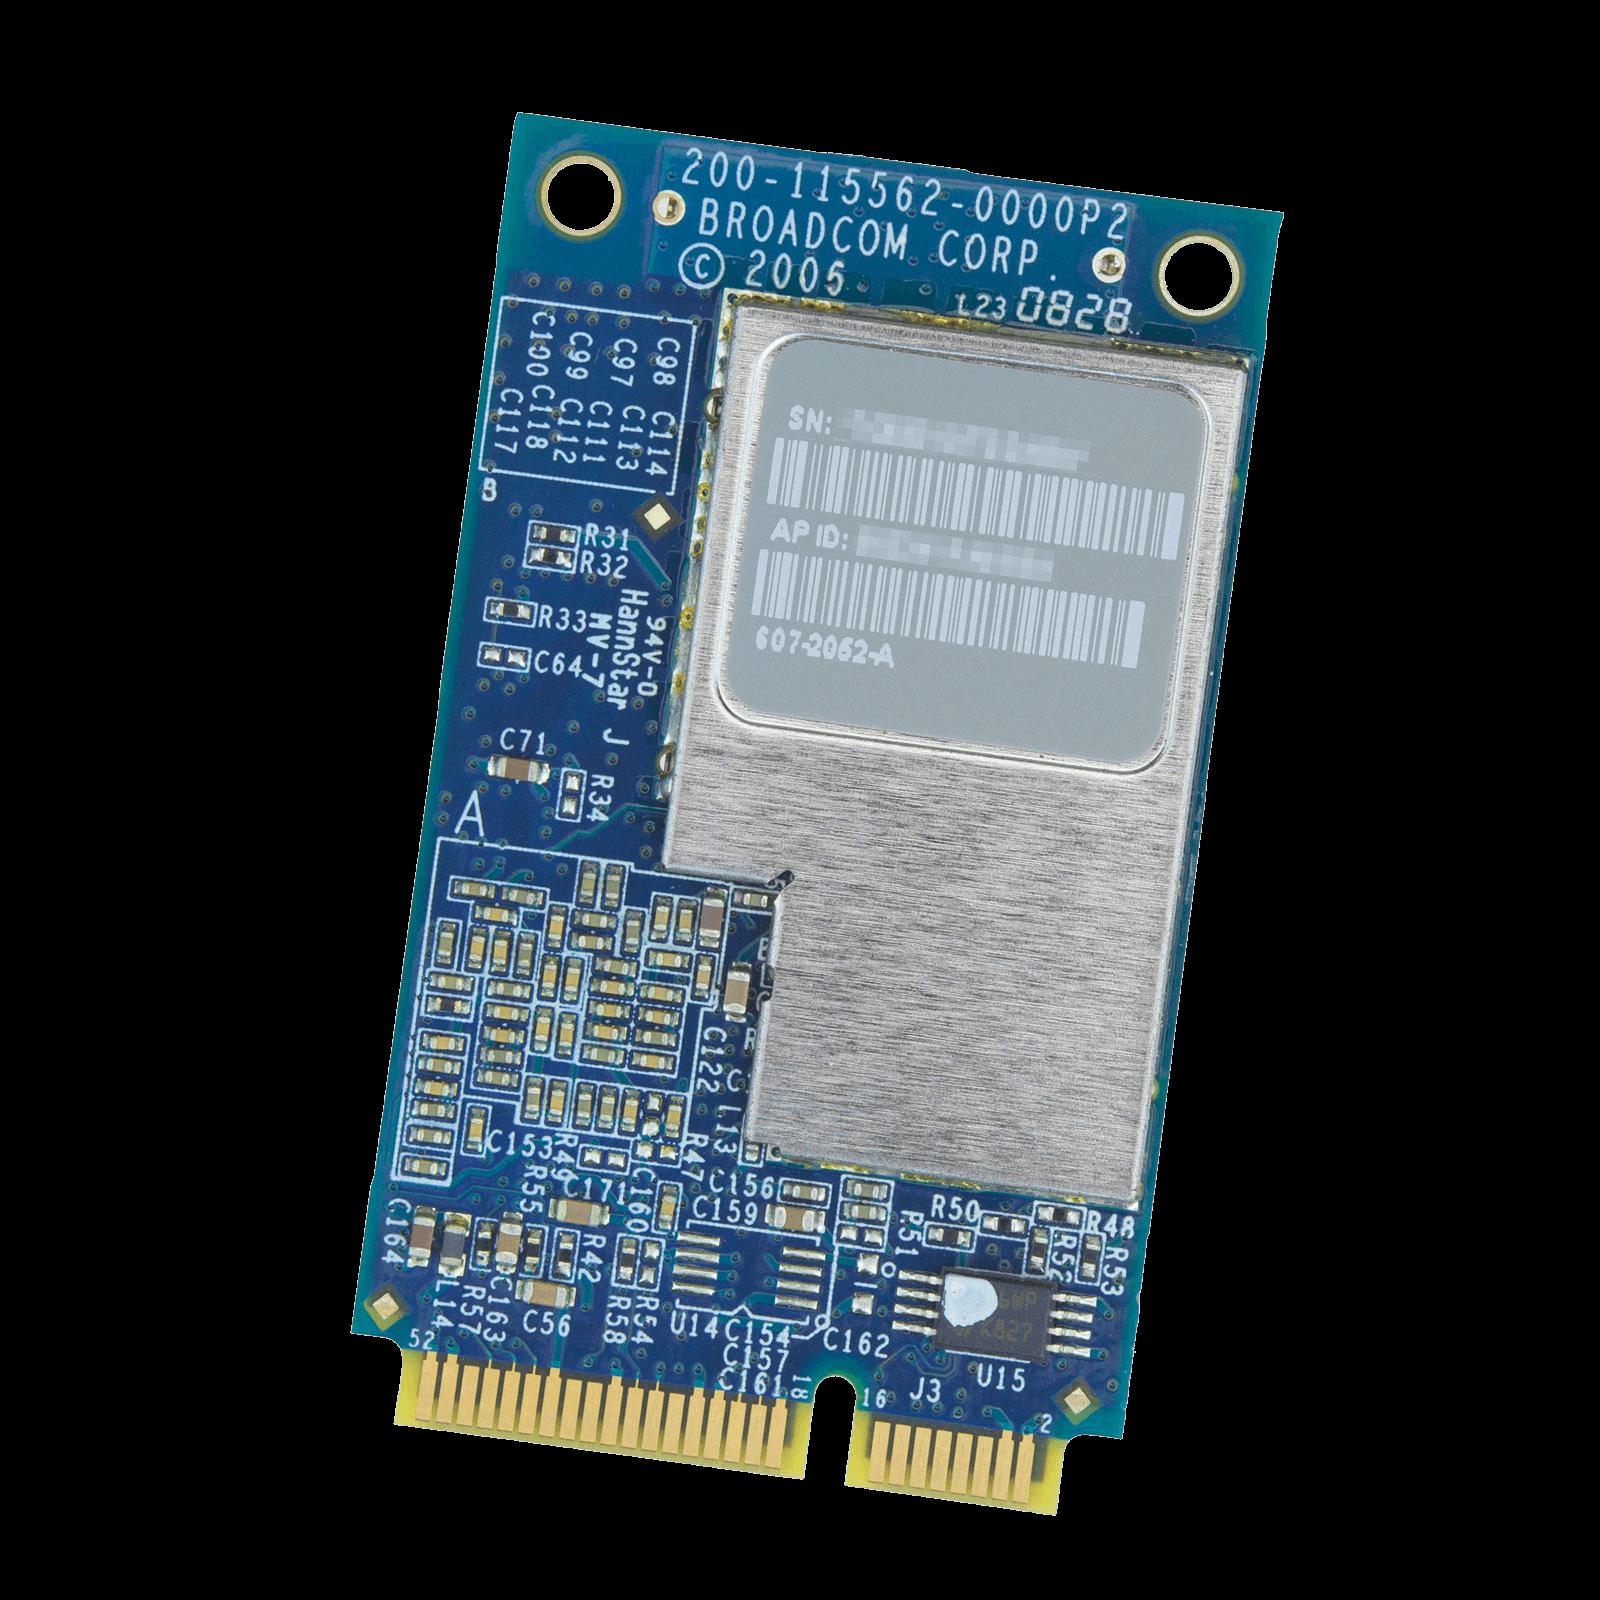 Apple MacBook Pro A1260 MB133LL//A  WiFi Wireless Card 607-2052-A 020-5280-A